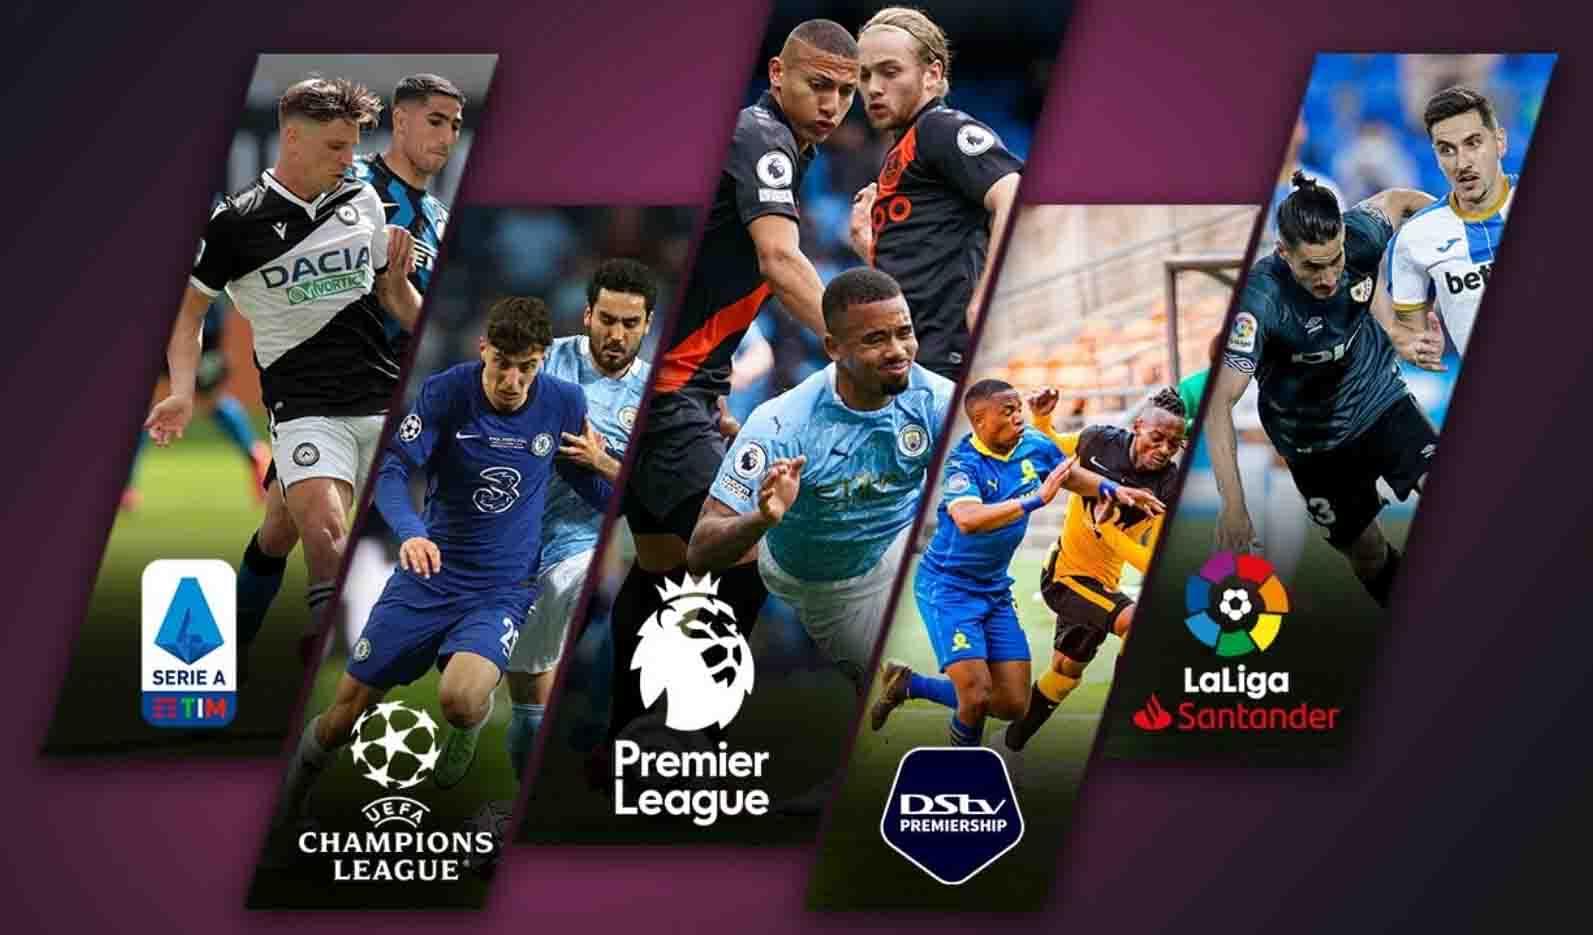 Enjoy all the Premier League action on the Showmax app